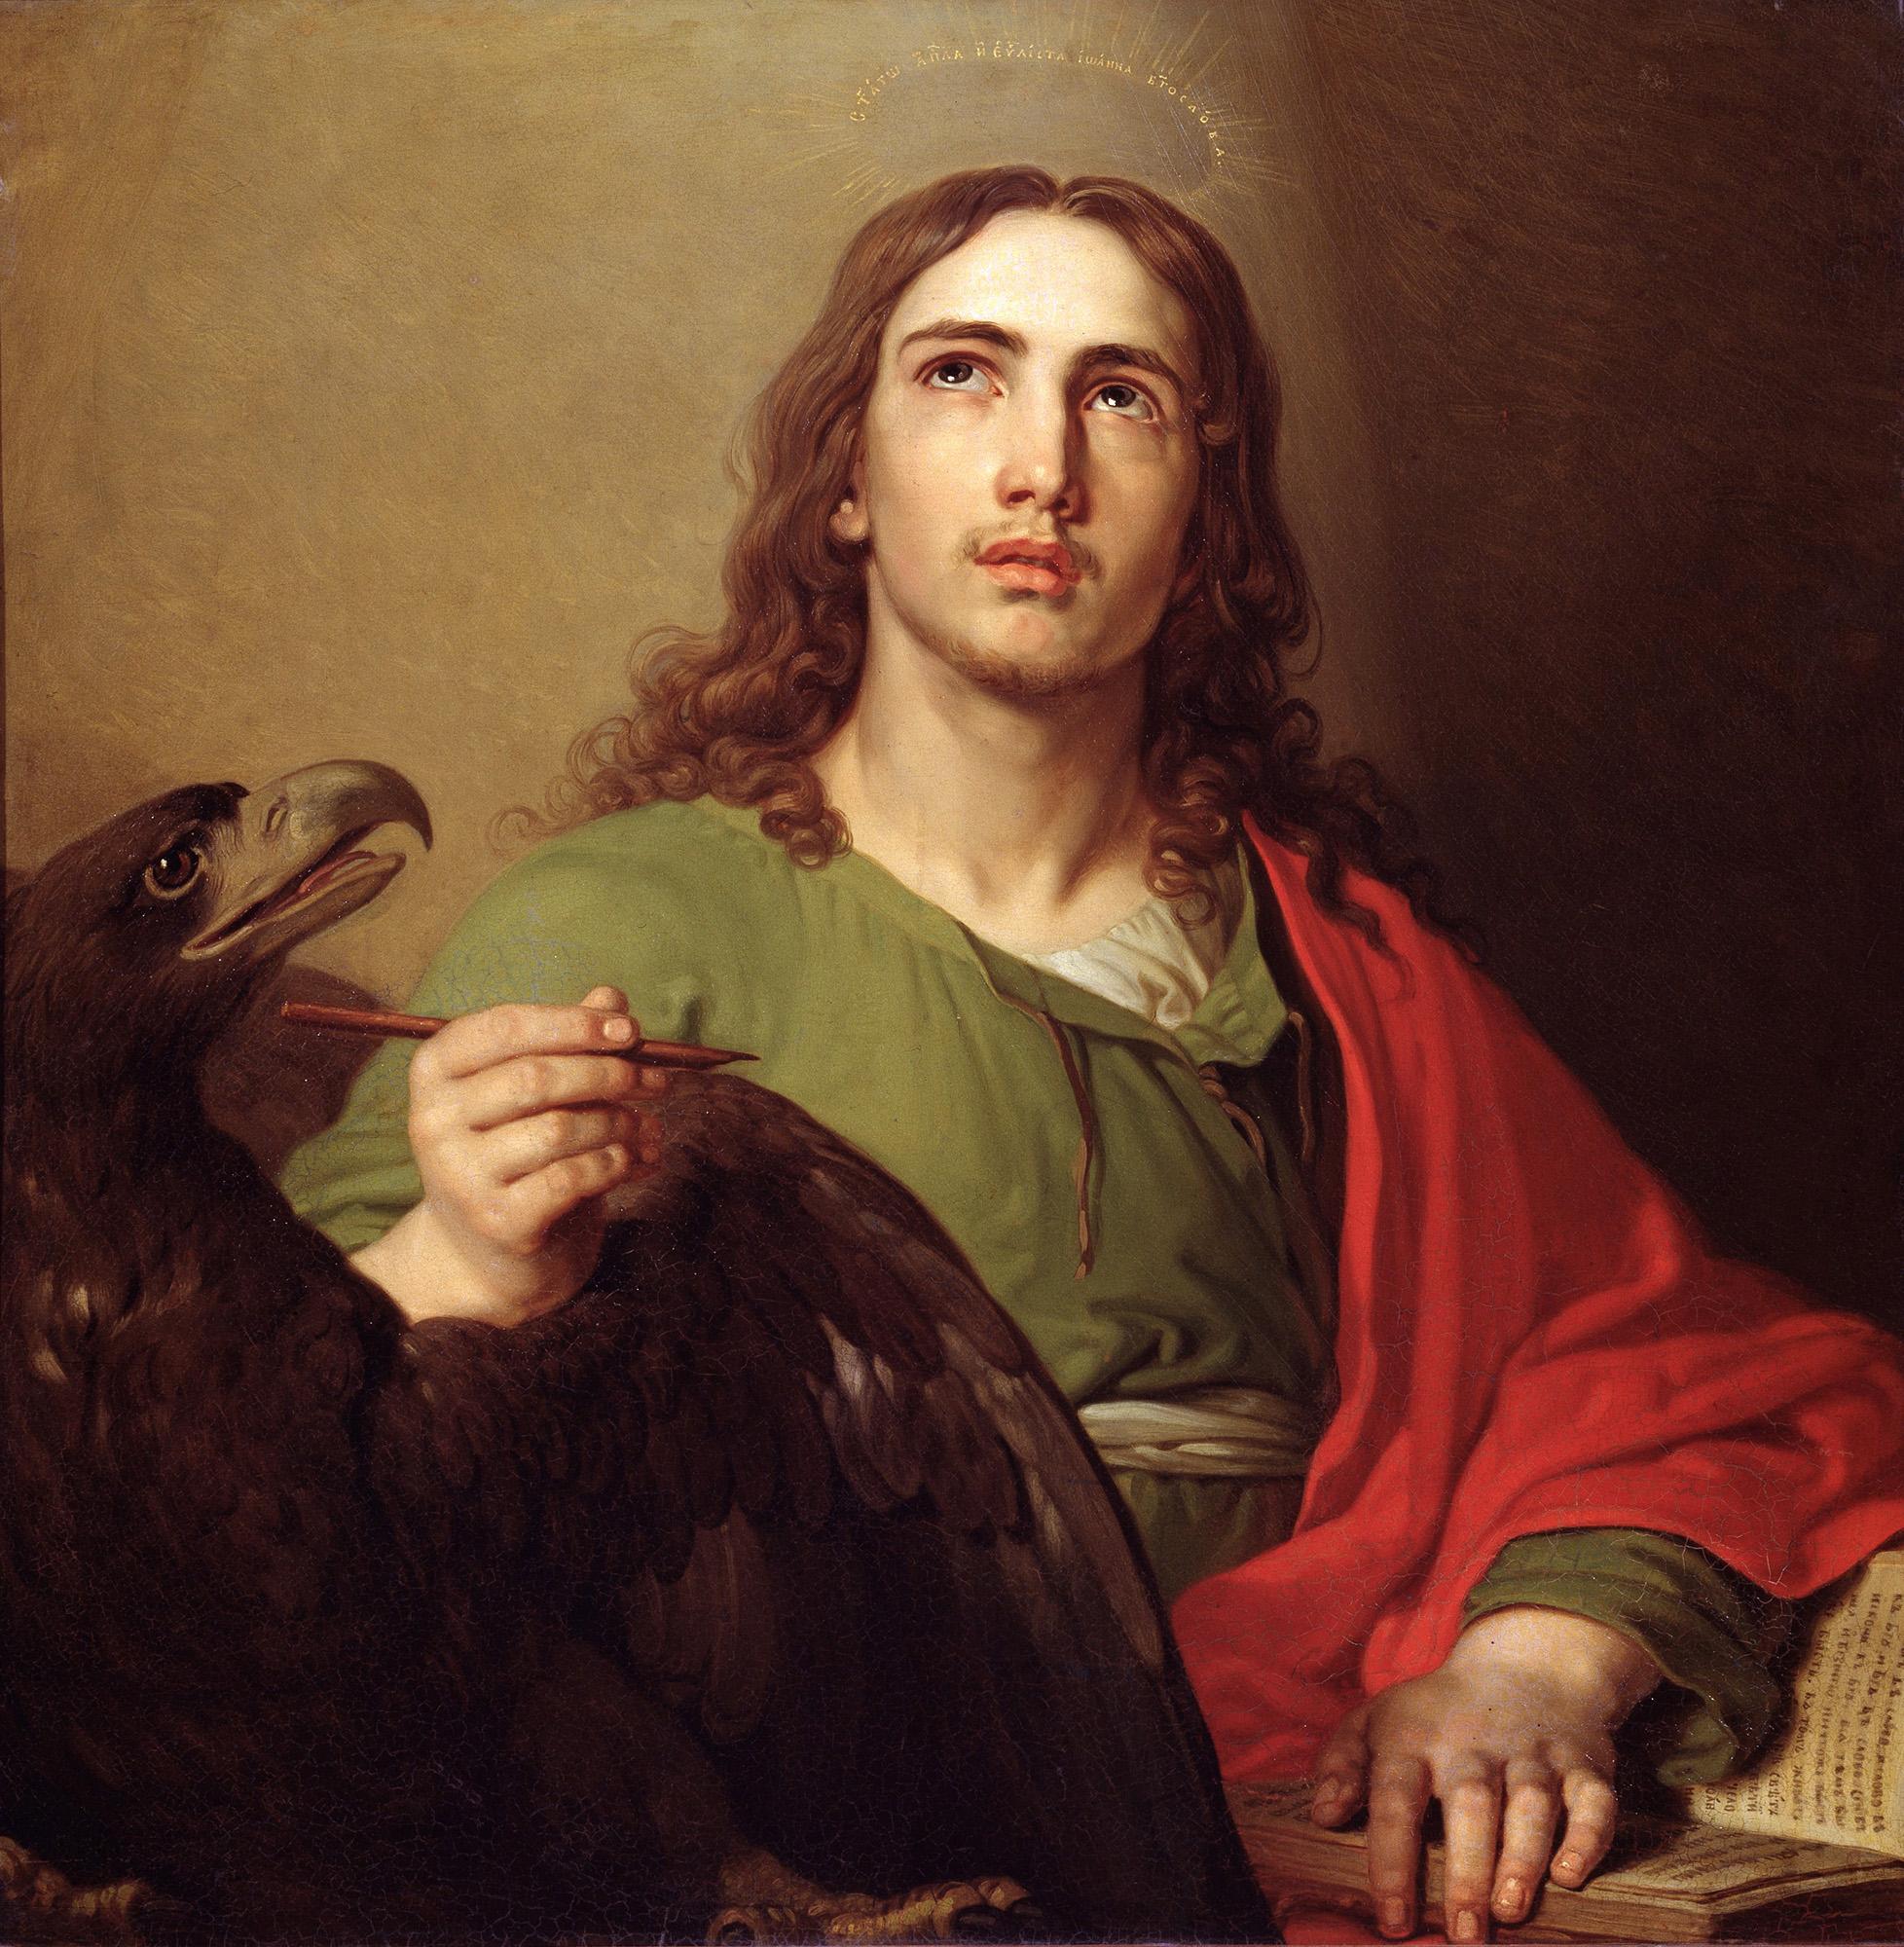 John the Evangelist, by Vladimir Borovikovsky, 1804-09